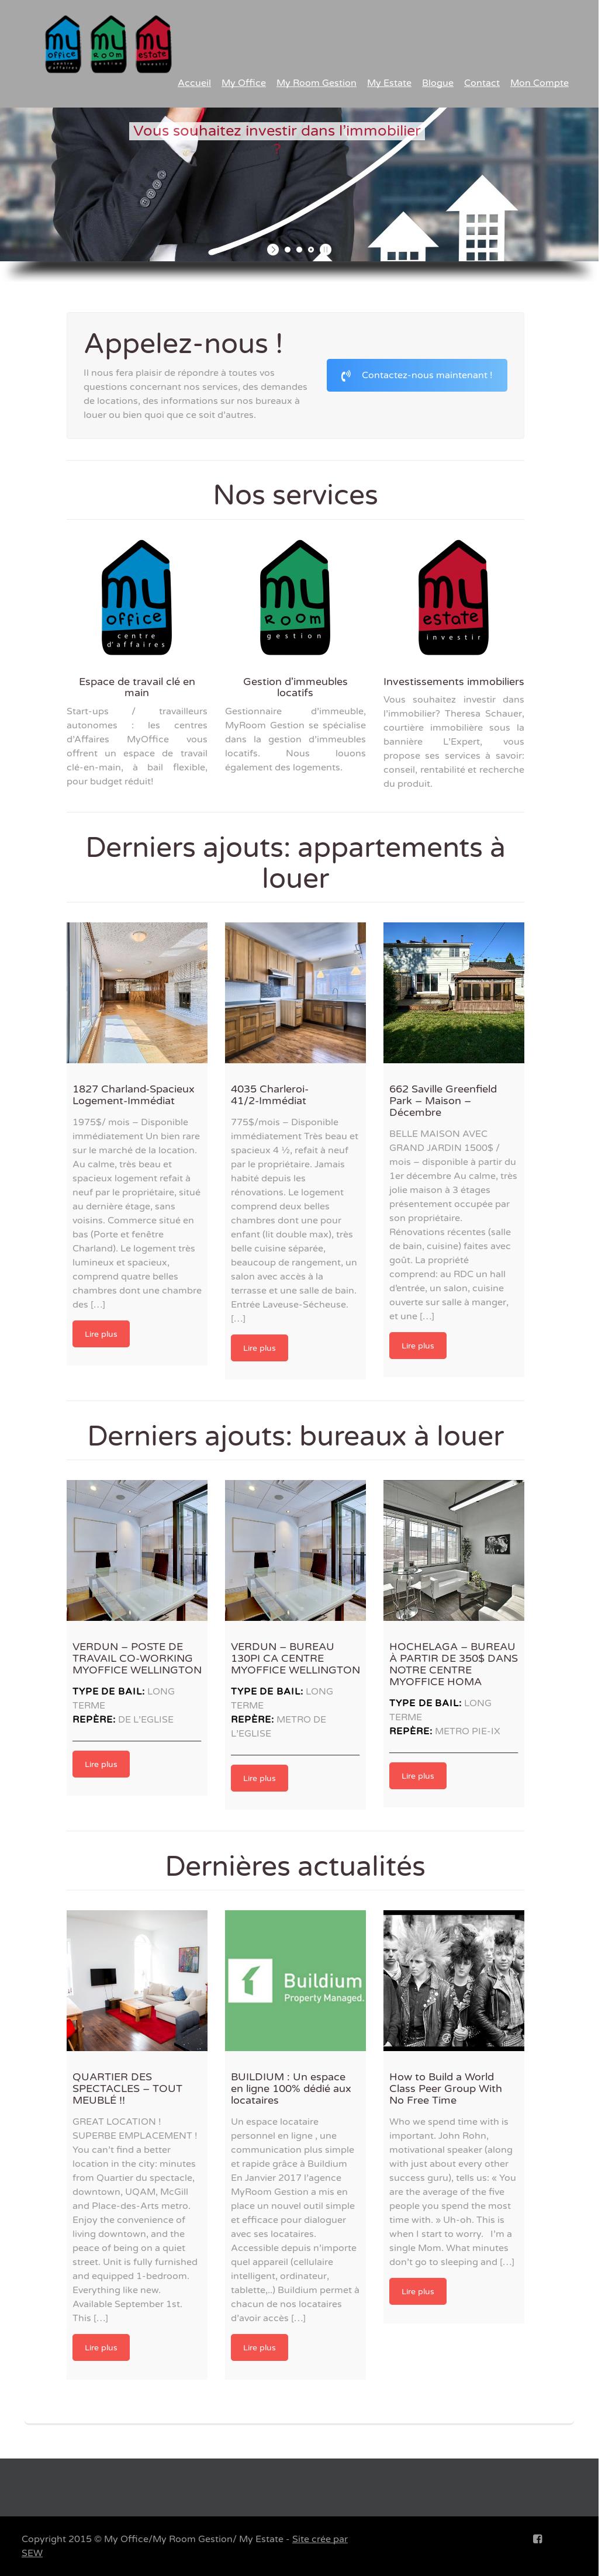 Salle De Bain Avec 2 Entrees myroom gestion competitors, revenue and employees - owler